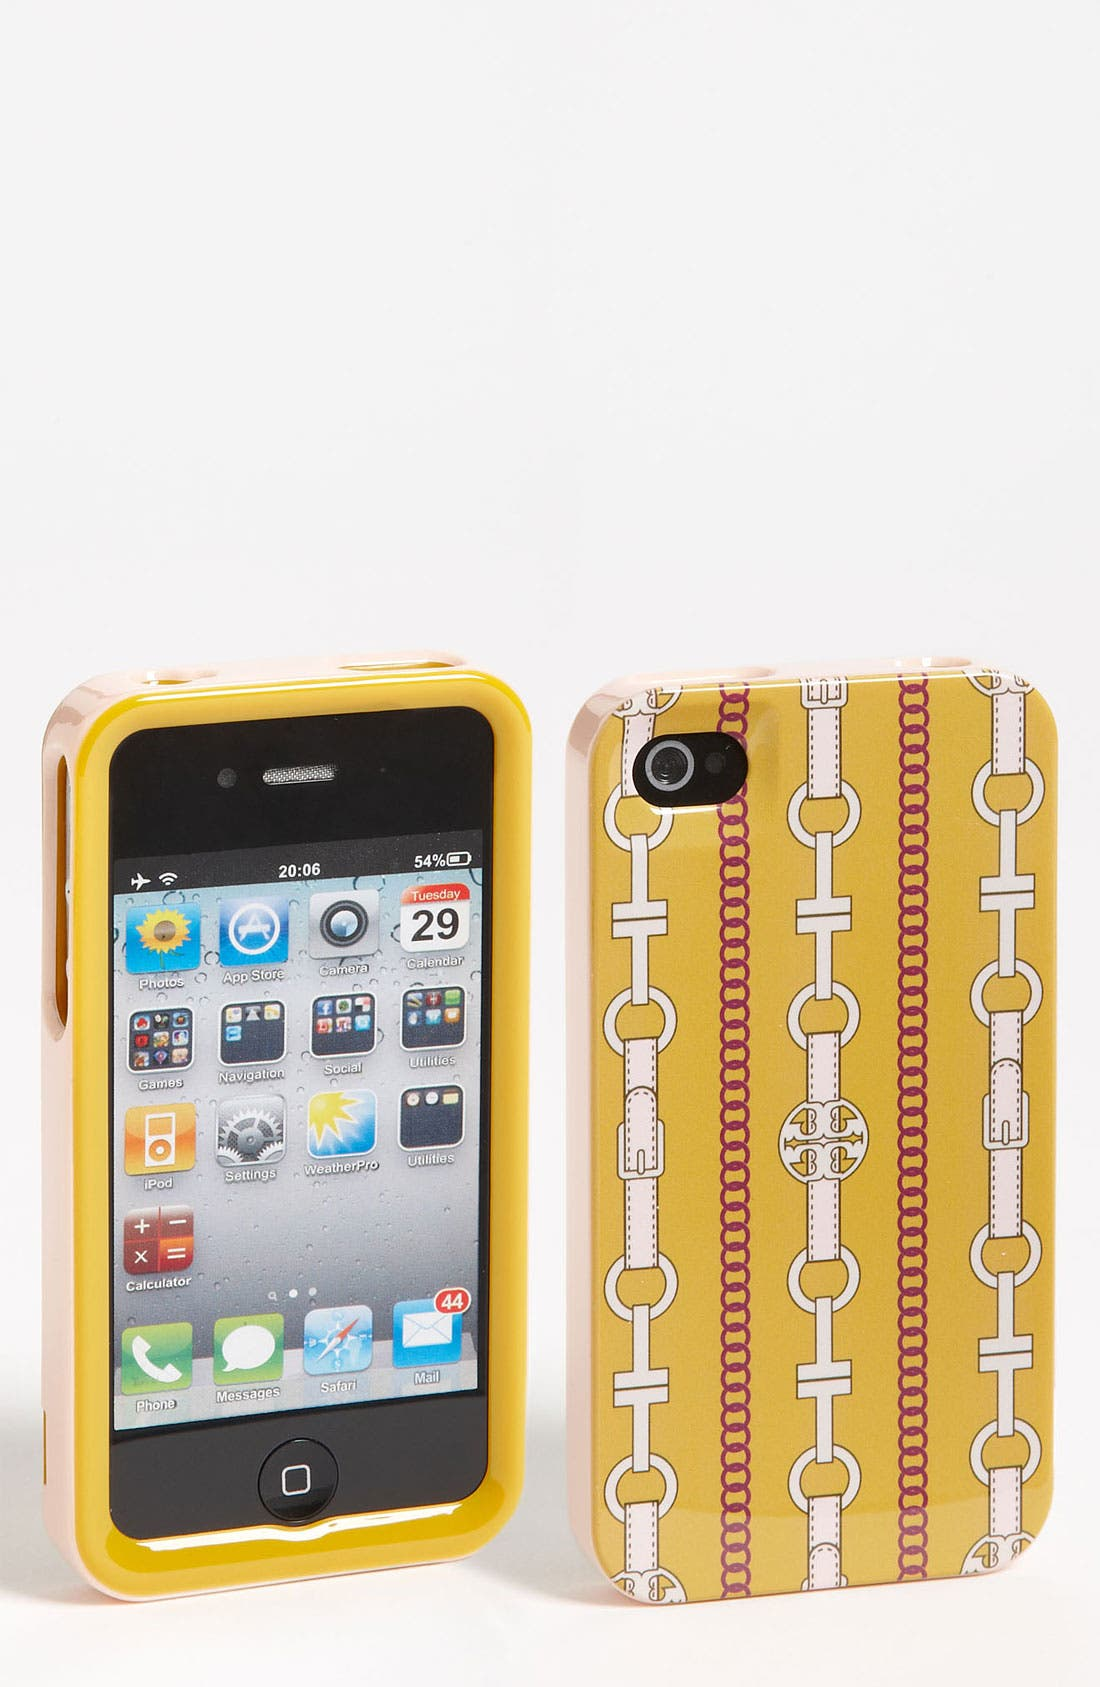 Main Image - Tory Burch 'T-Belts' iPhone 4 Case